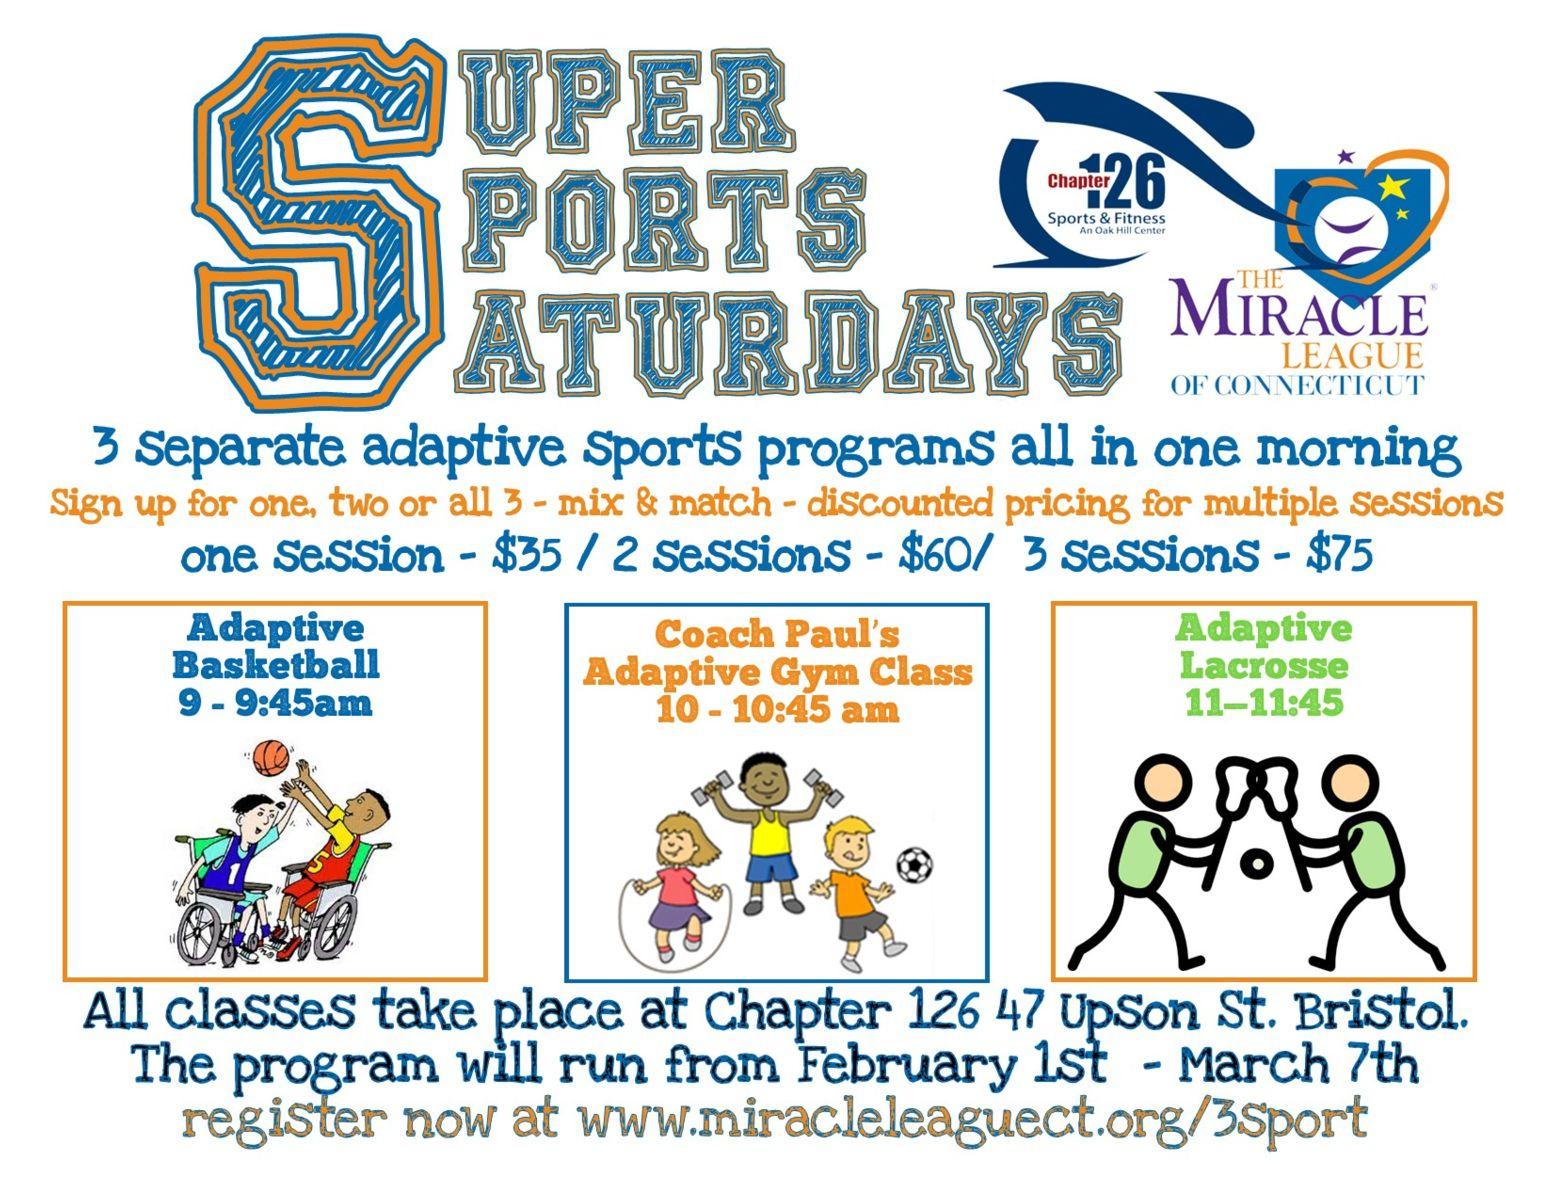 Adaptive Sports Programs